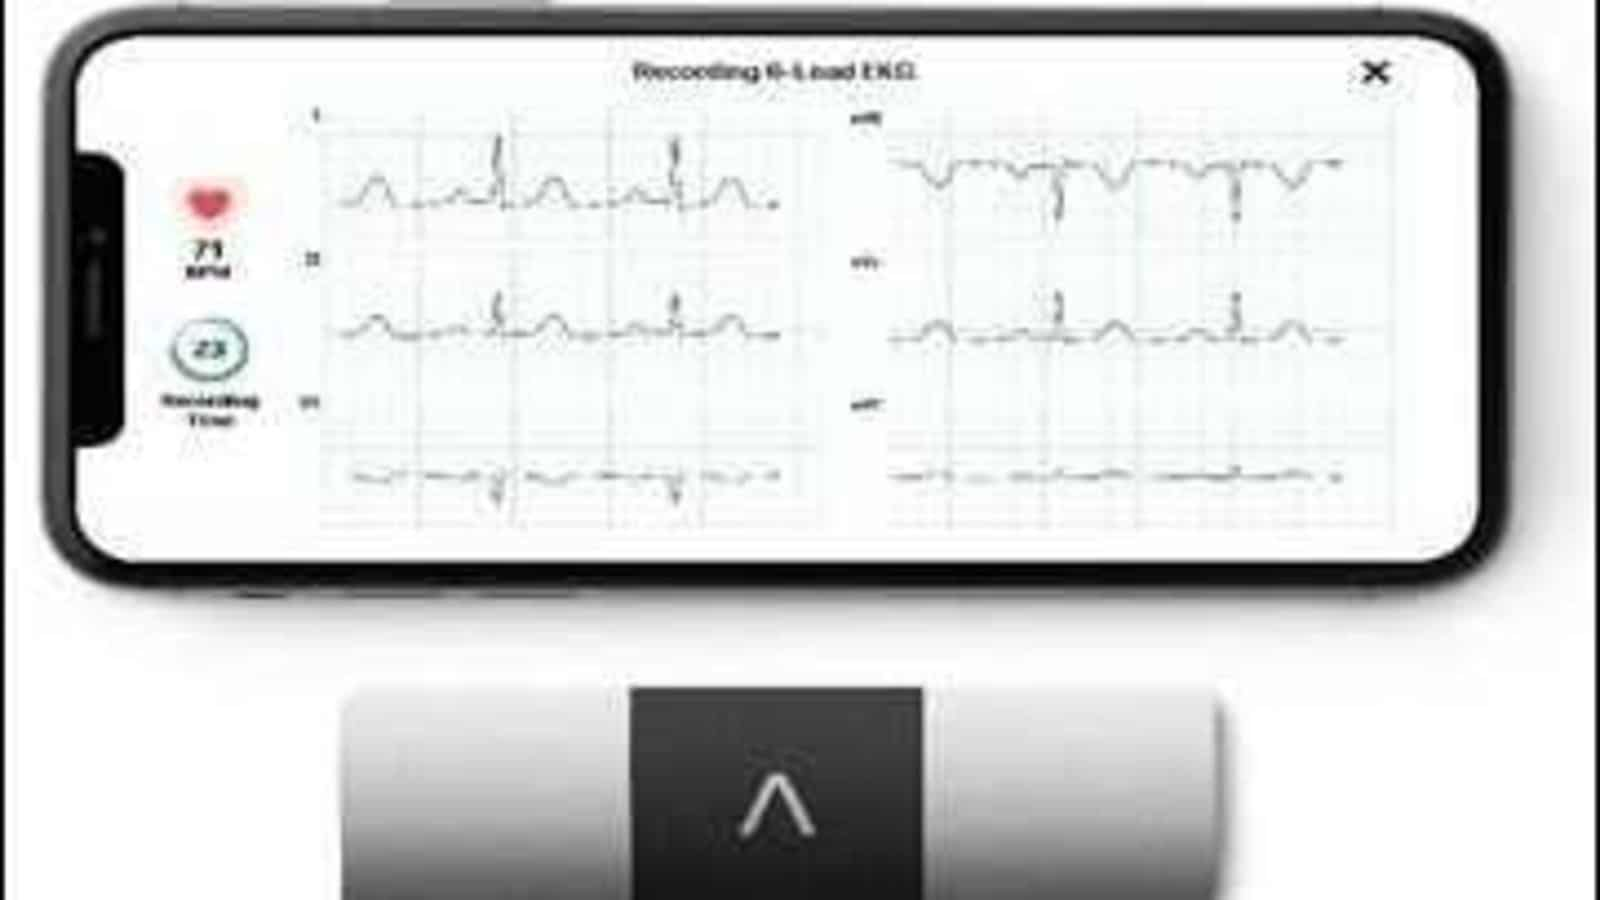 livemint.com - Leroy Leo - US-firm AliveCor taps India telemedicine market with ECG device